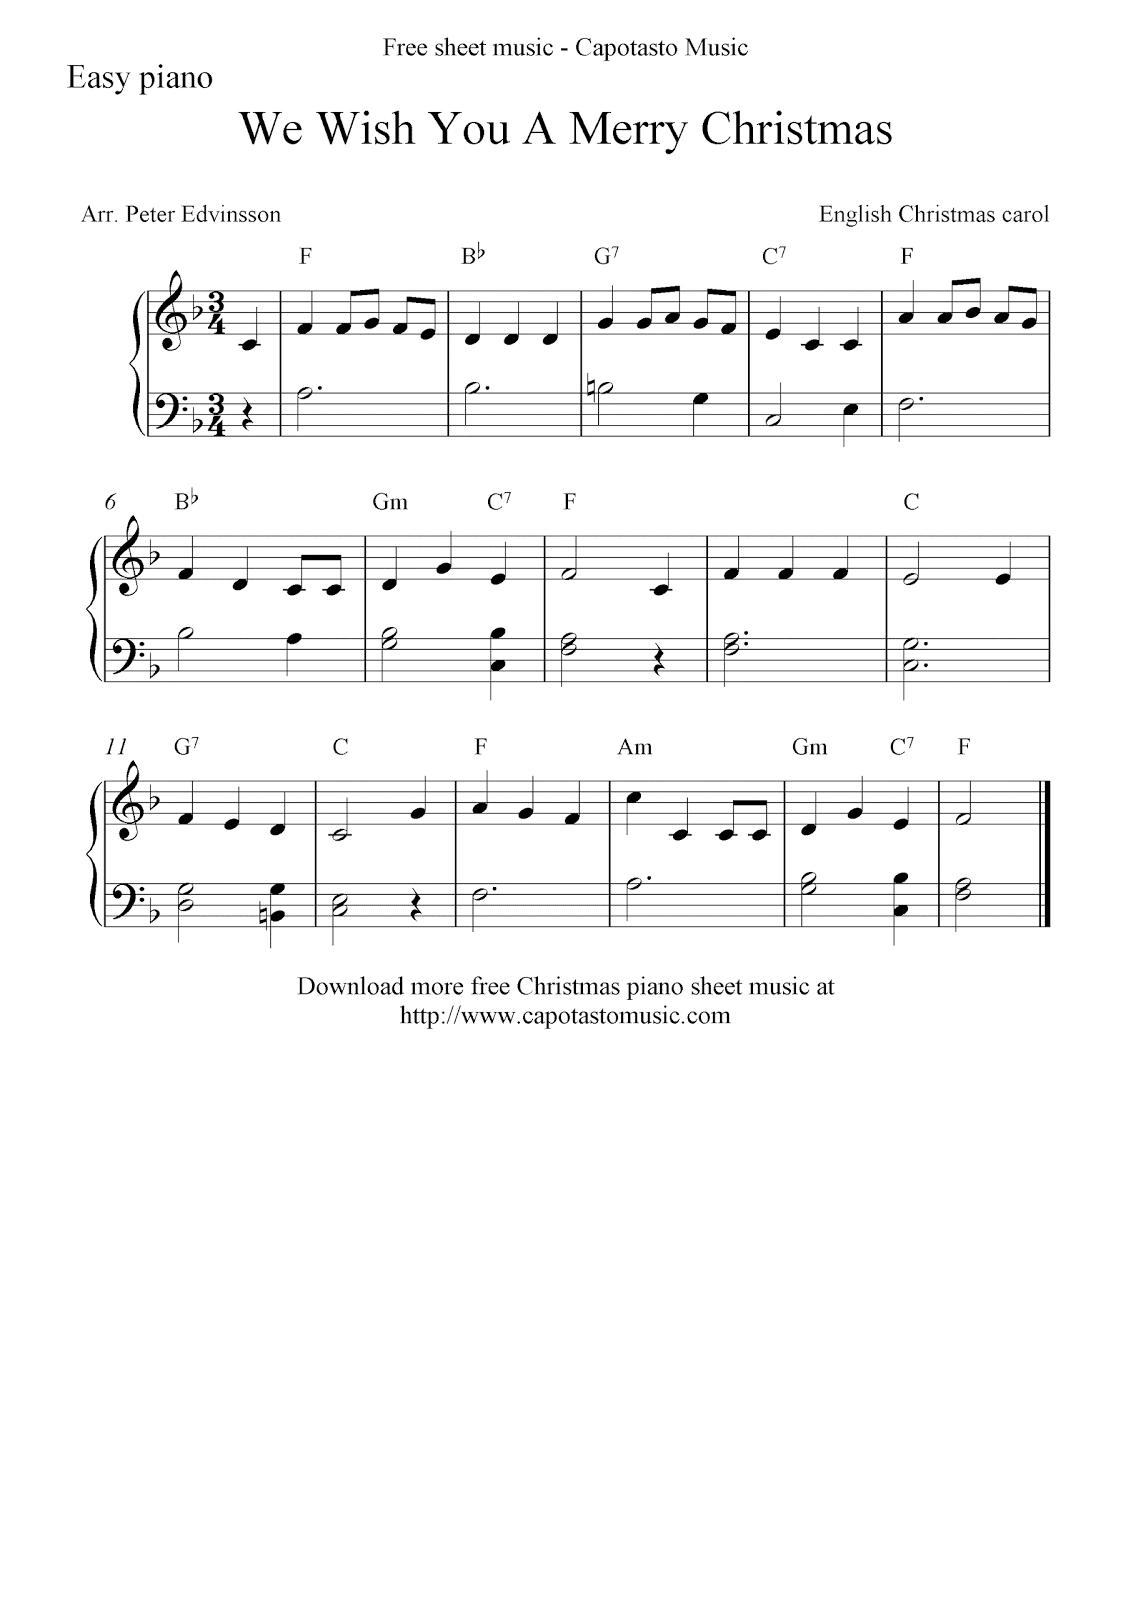 Free Christmas Sheet Music For Easy Piano, We Wish You A Merry Christmas - Christmas Piano Sheet Music Easy Free Printable